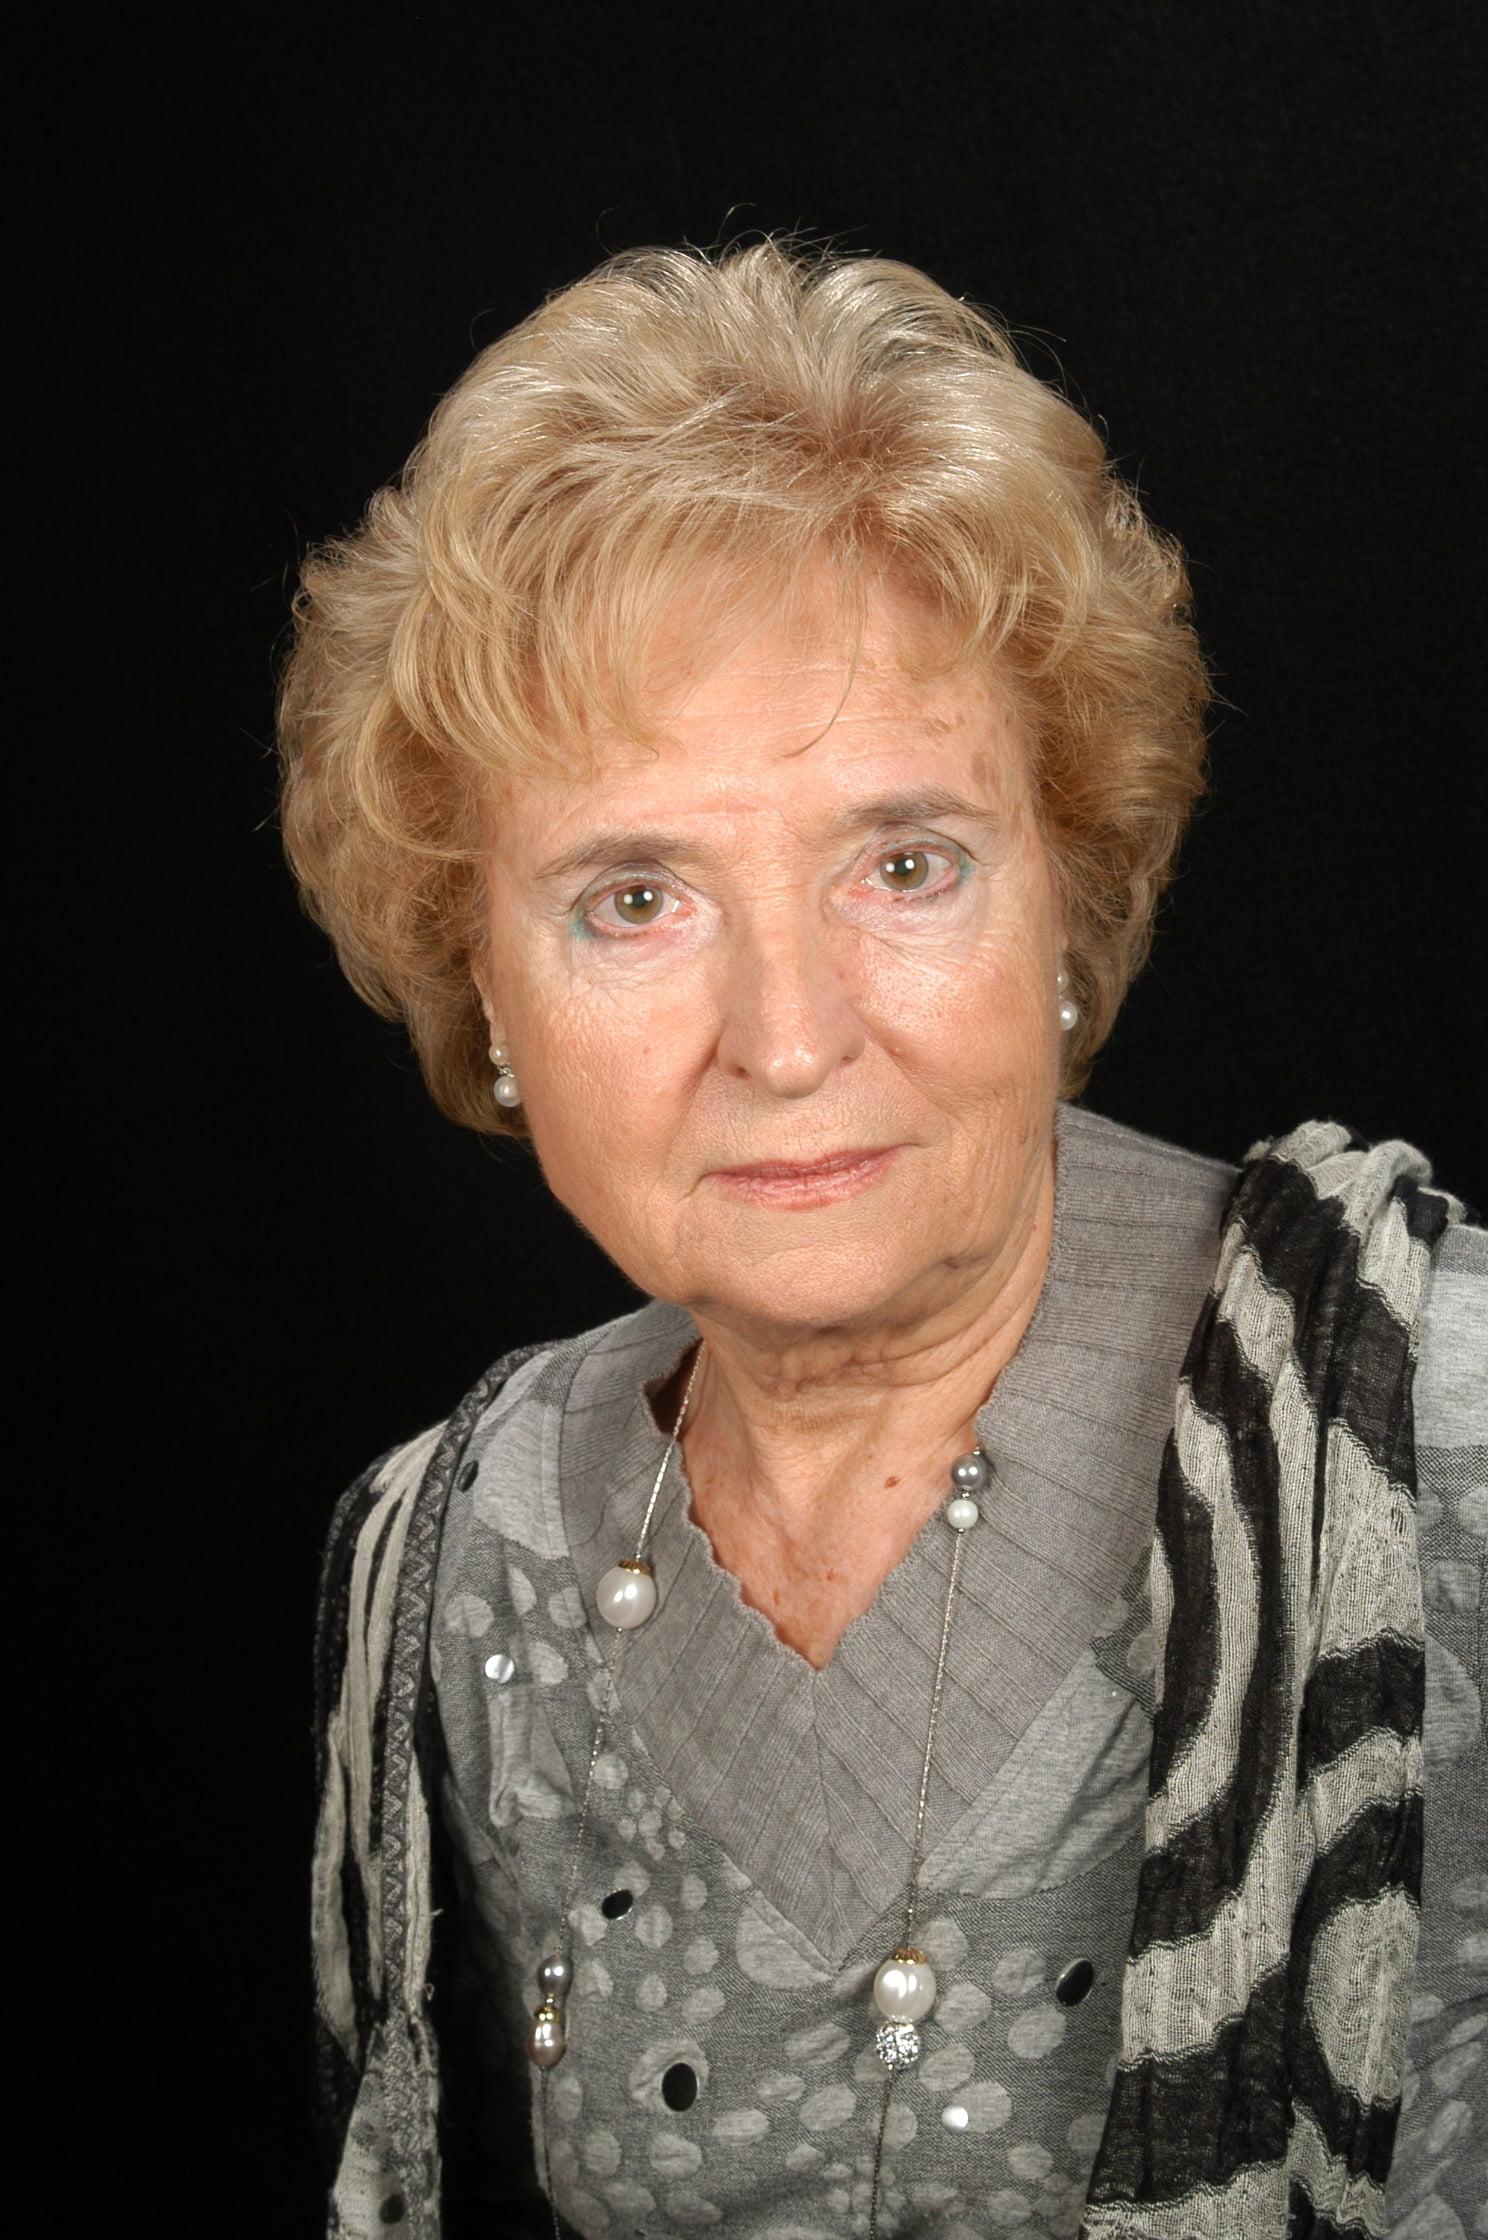 Sra. Josefa Alavedra Marín